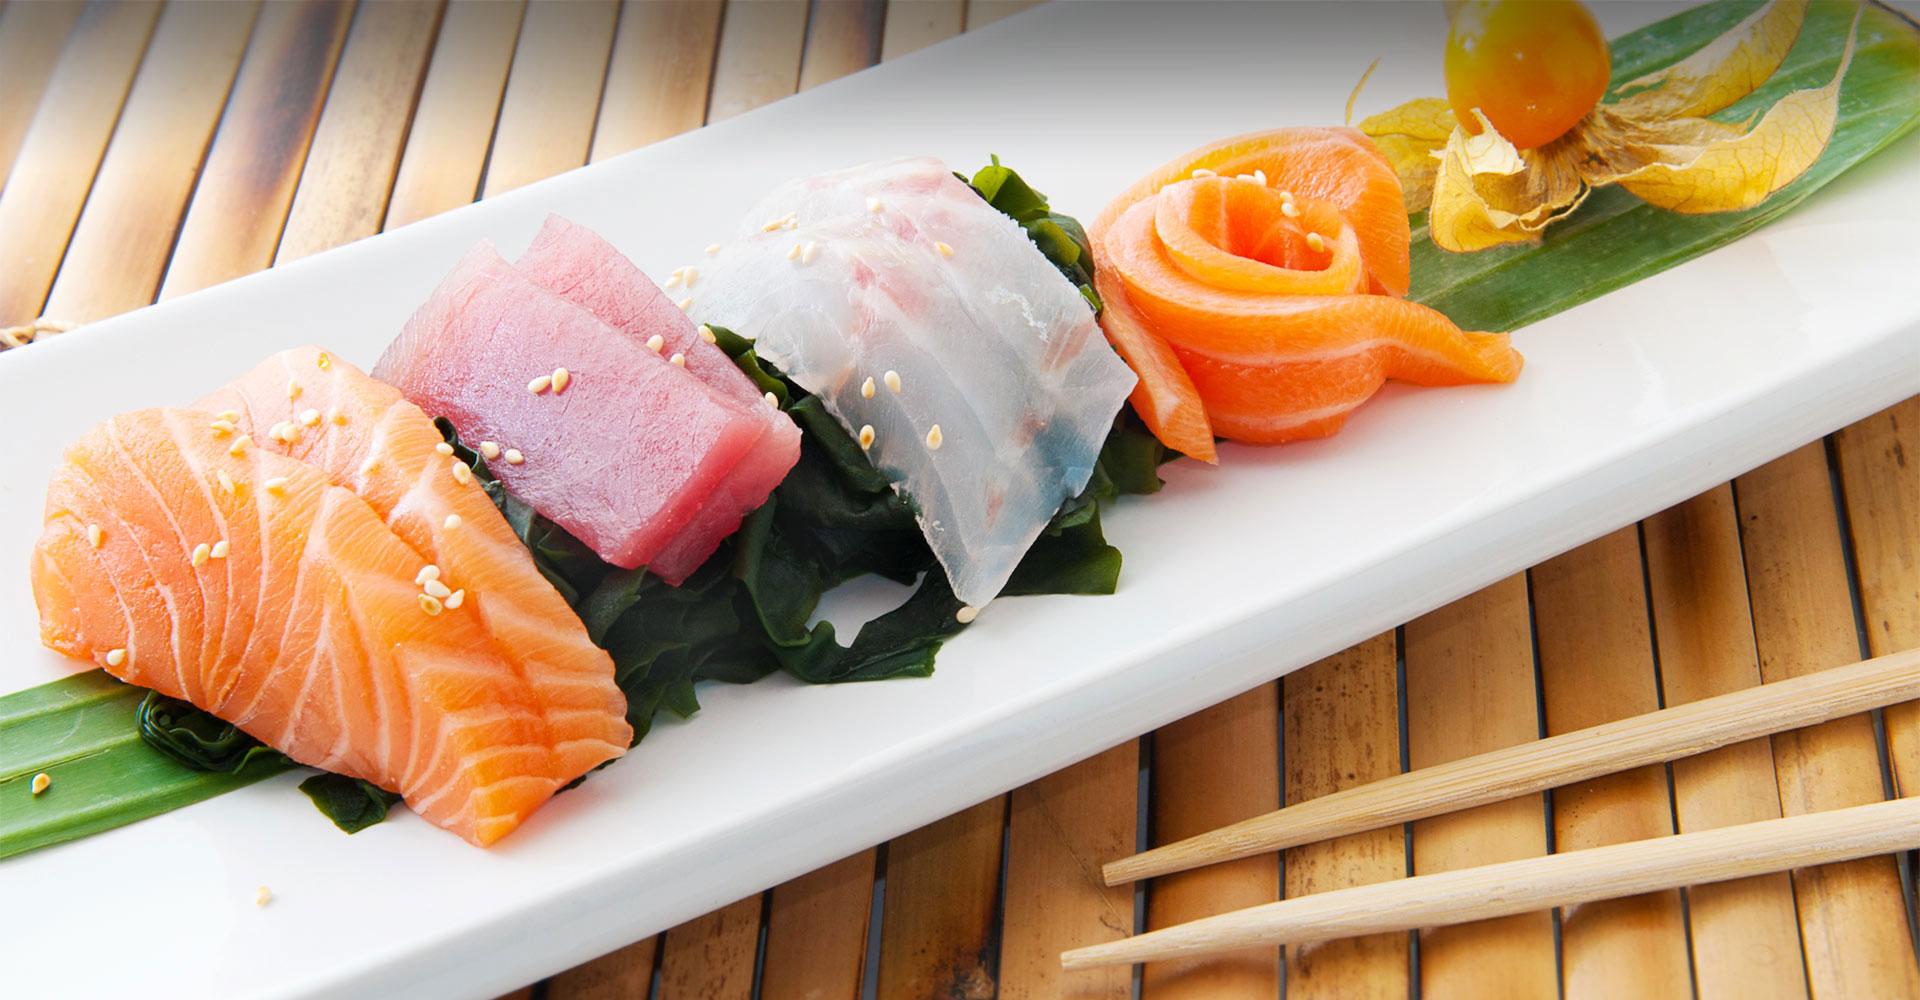 mode-sushi-take-away-consegna-ristorante-giapponese-padova-slide3